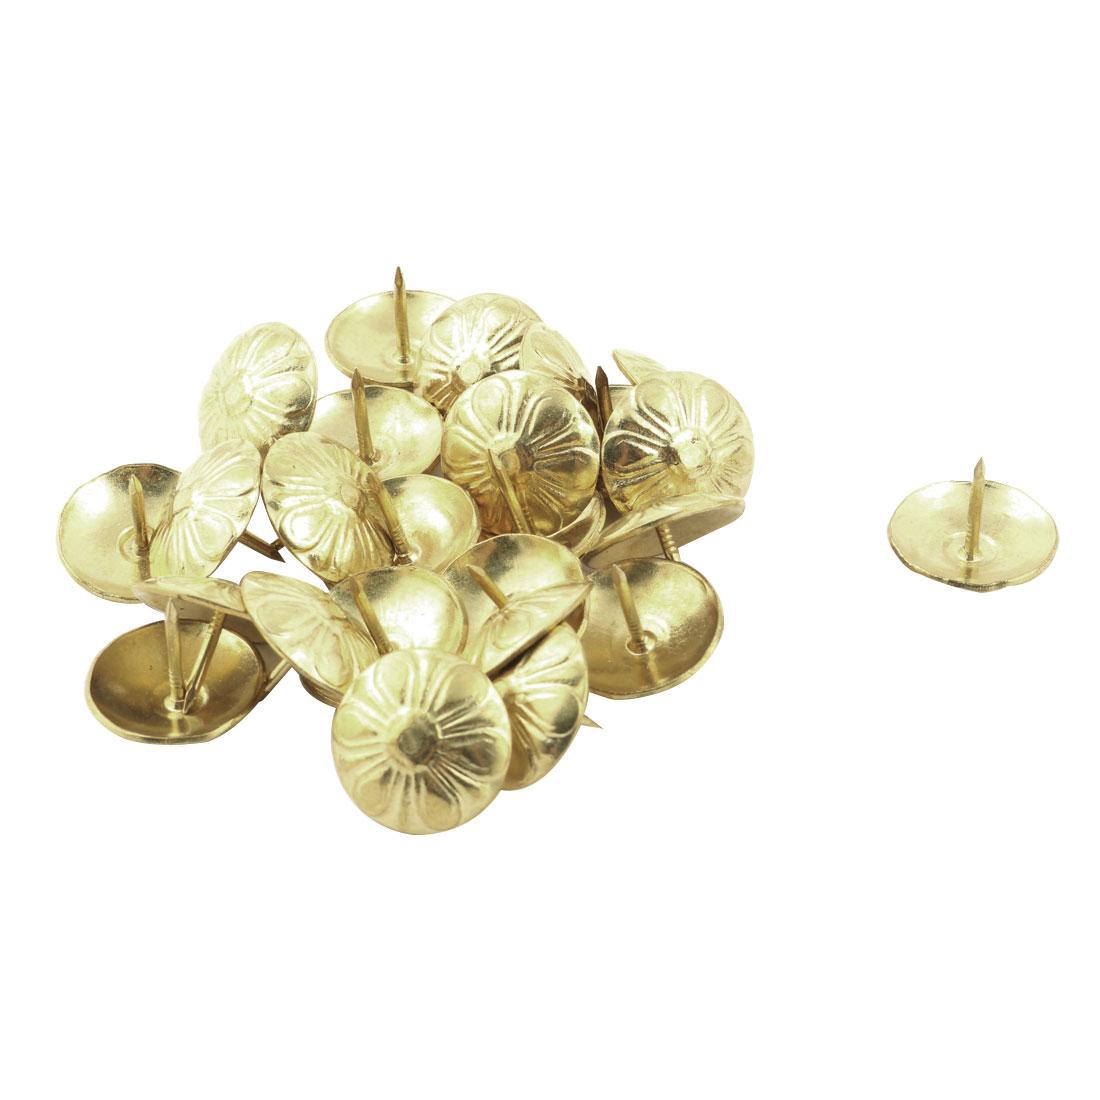 Household Furniture Chrysanthemum Pattern Upholstery Tack Nail Gold Tone 19 x 15mm 25pcs